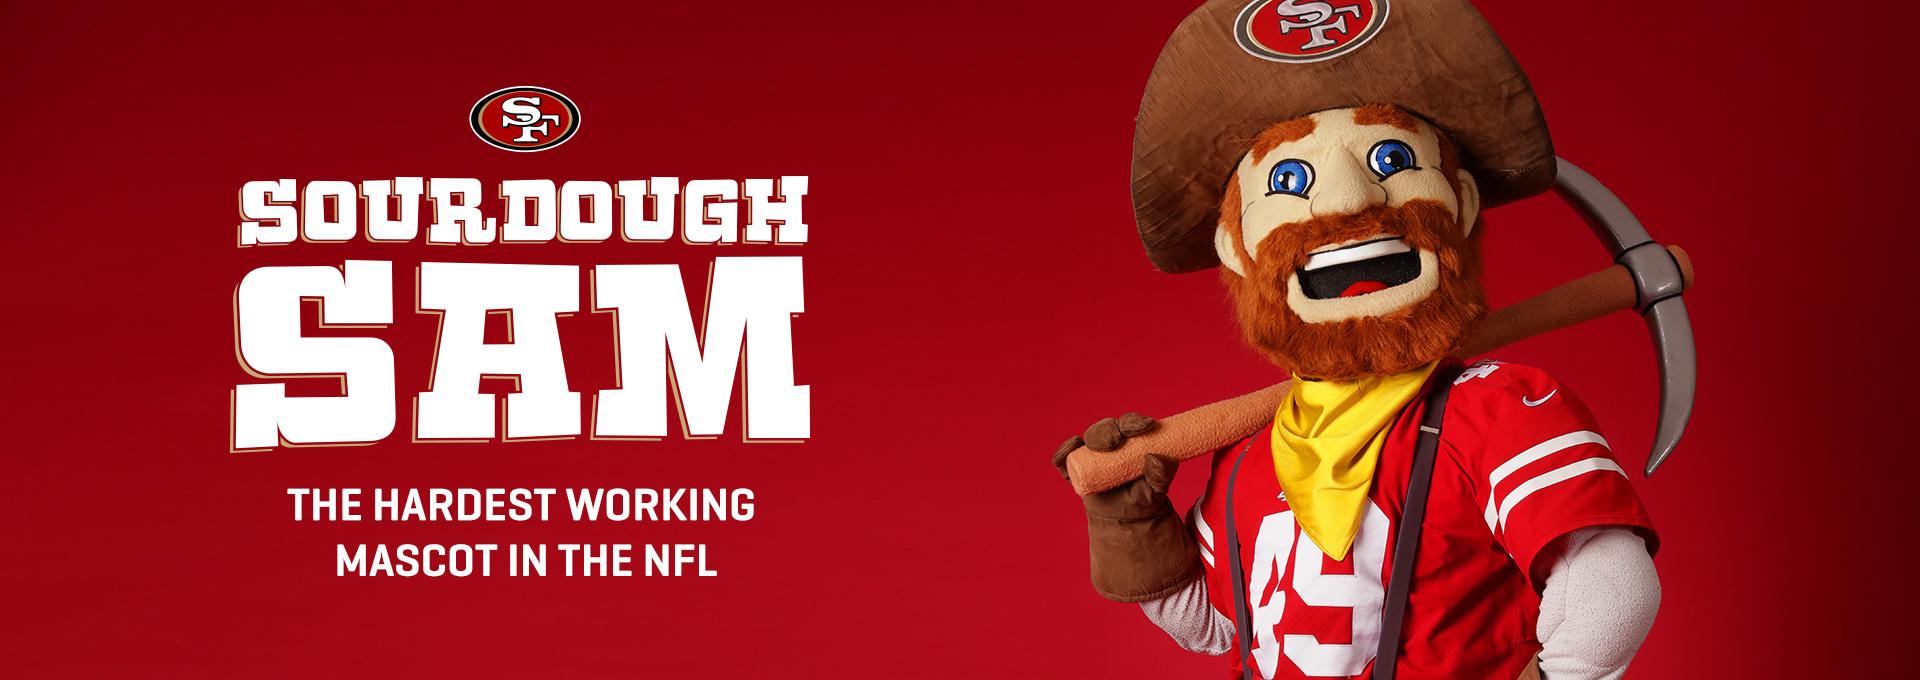 49ers Fans   San Francisco 49ers – 49ers.com